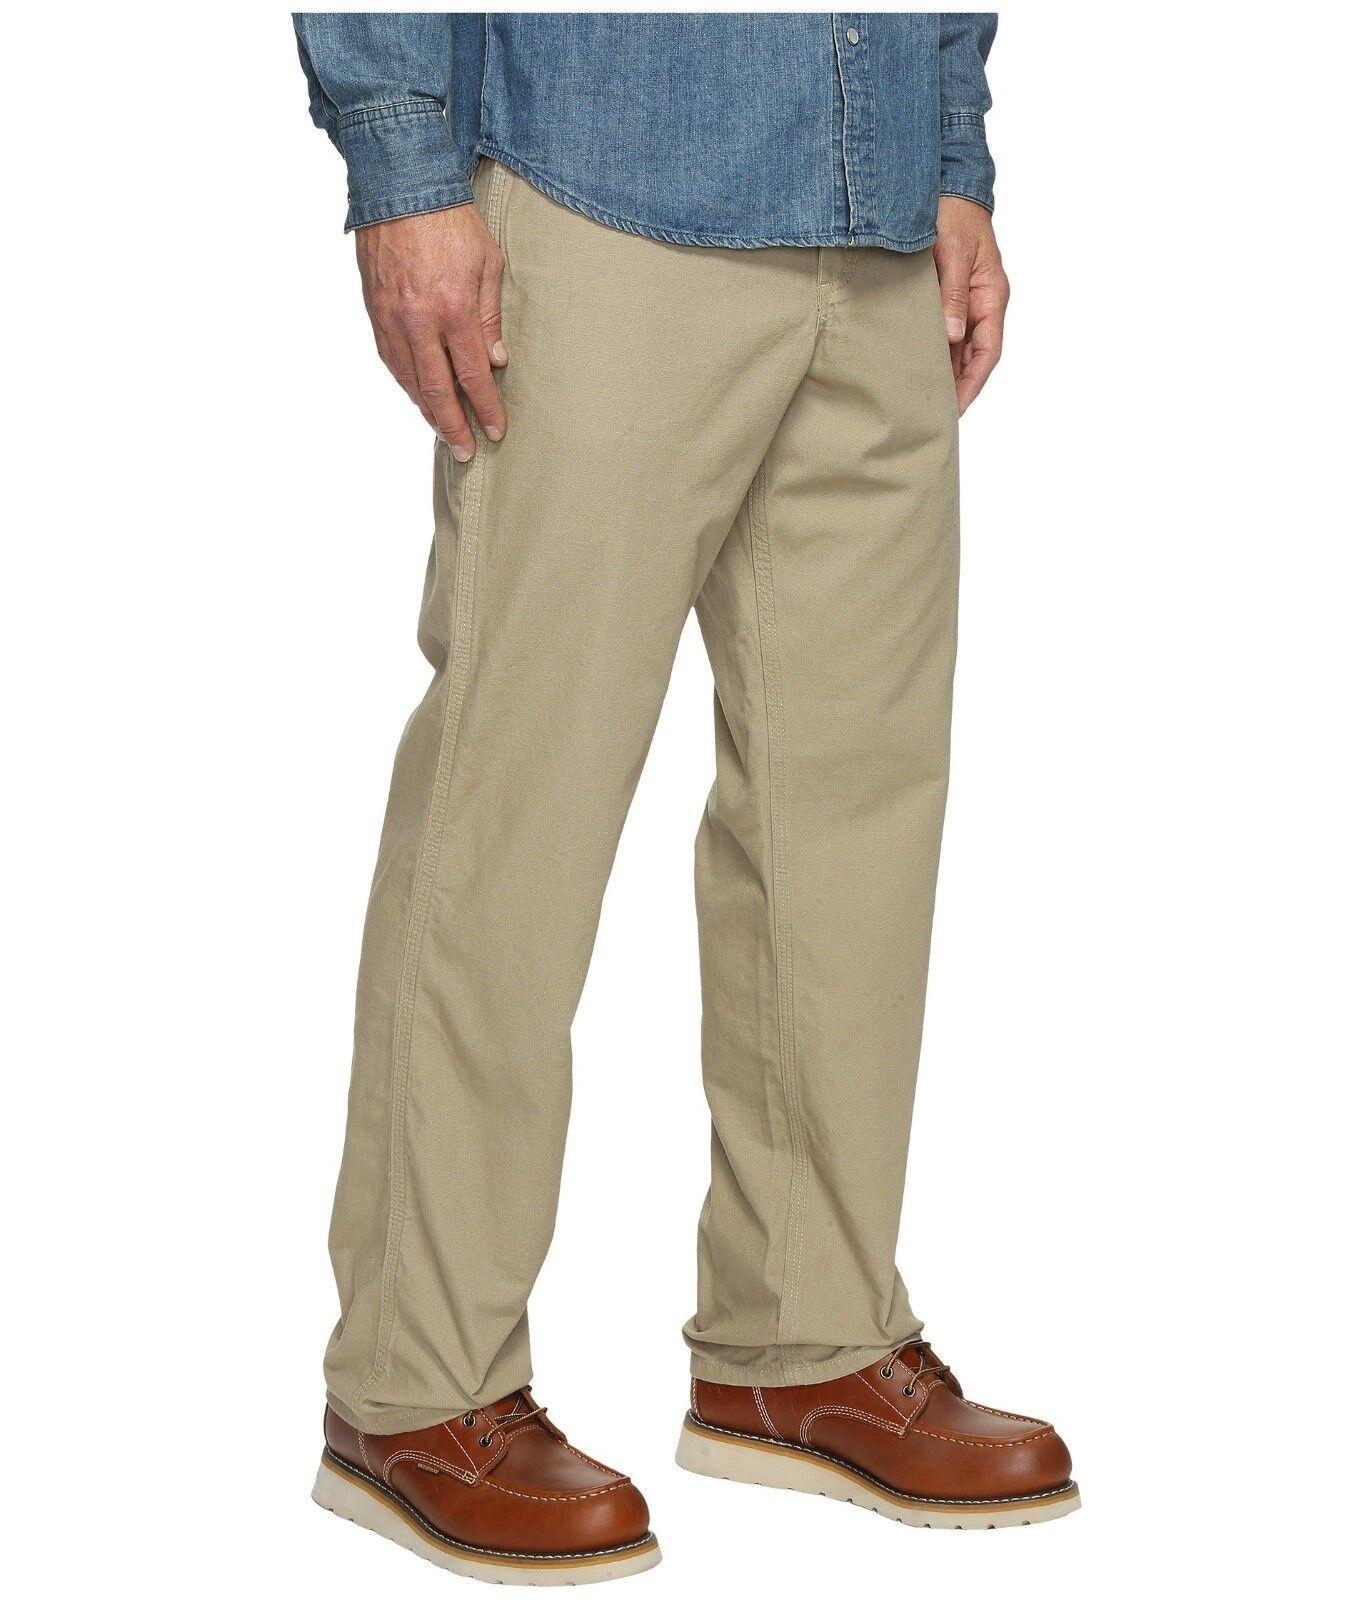 Carhartt Men Pants Loose Fit Canvas Carpenter Straight Leg golden Khaki 40 x 32